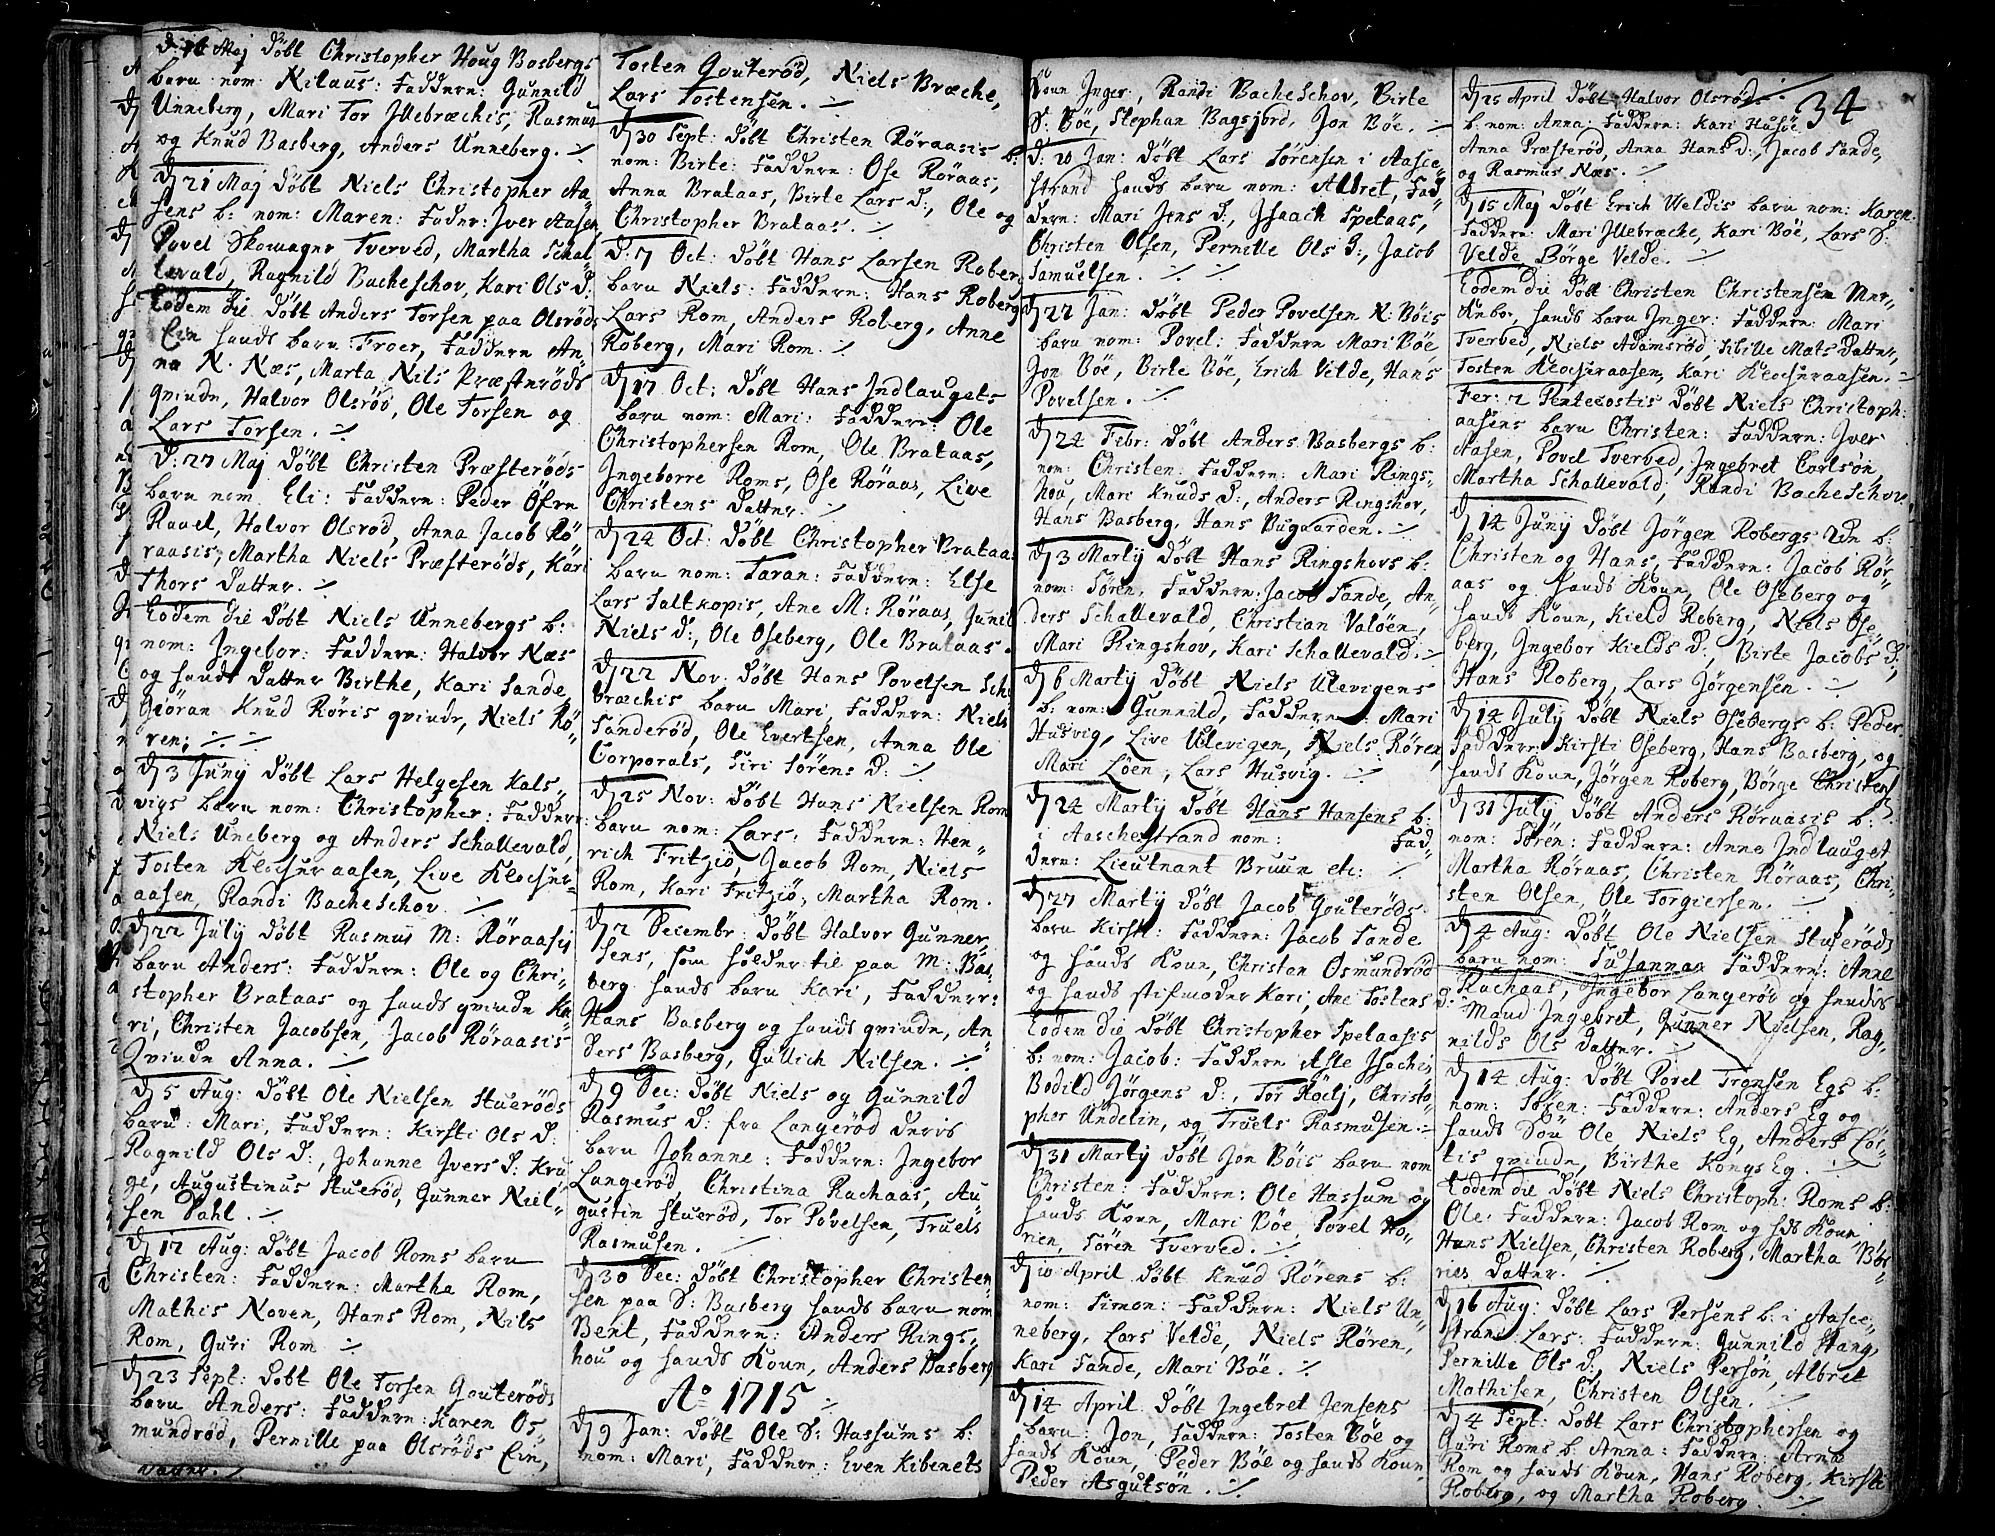 SAKO, Sem kirkebøker, F/Fb/L0001: Ministerialbok nr. II 1, 1702-1764, s. 34